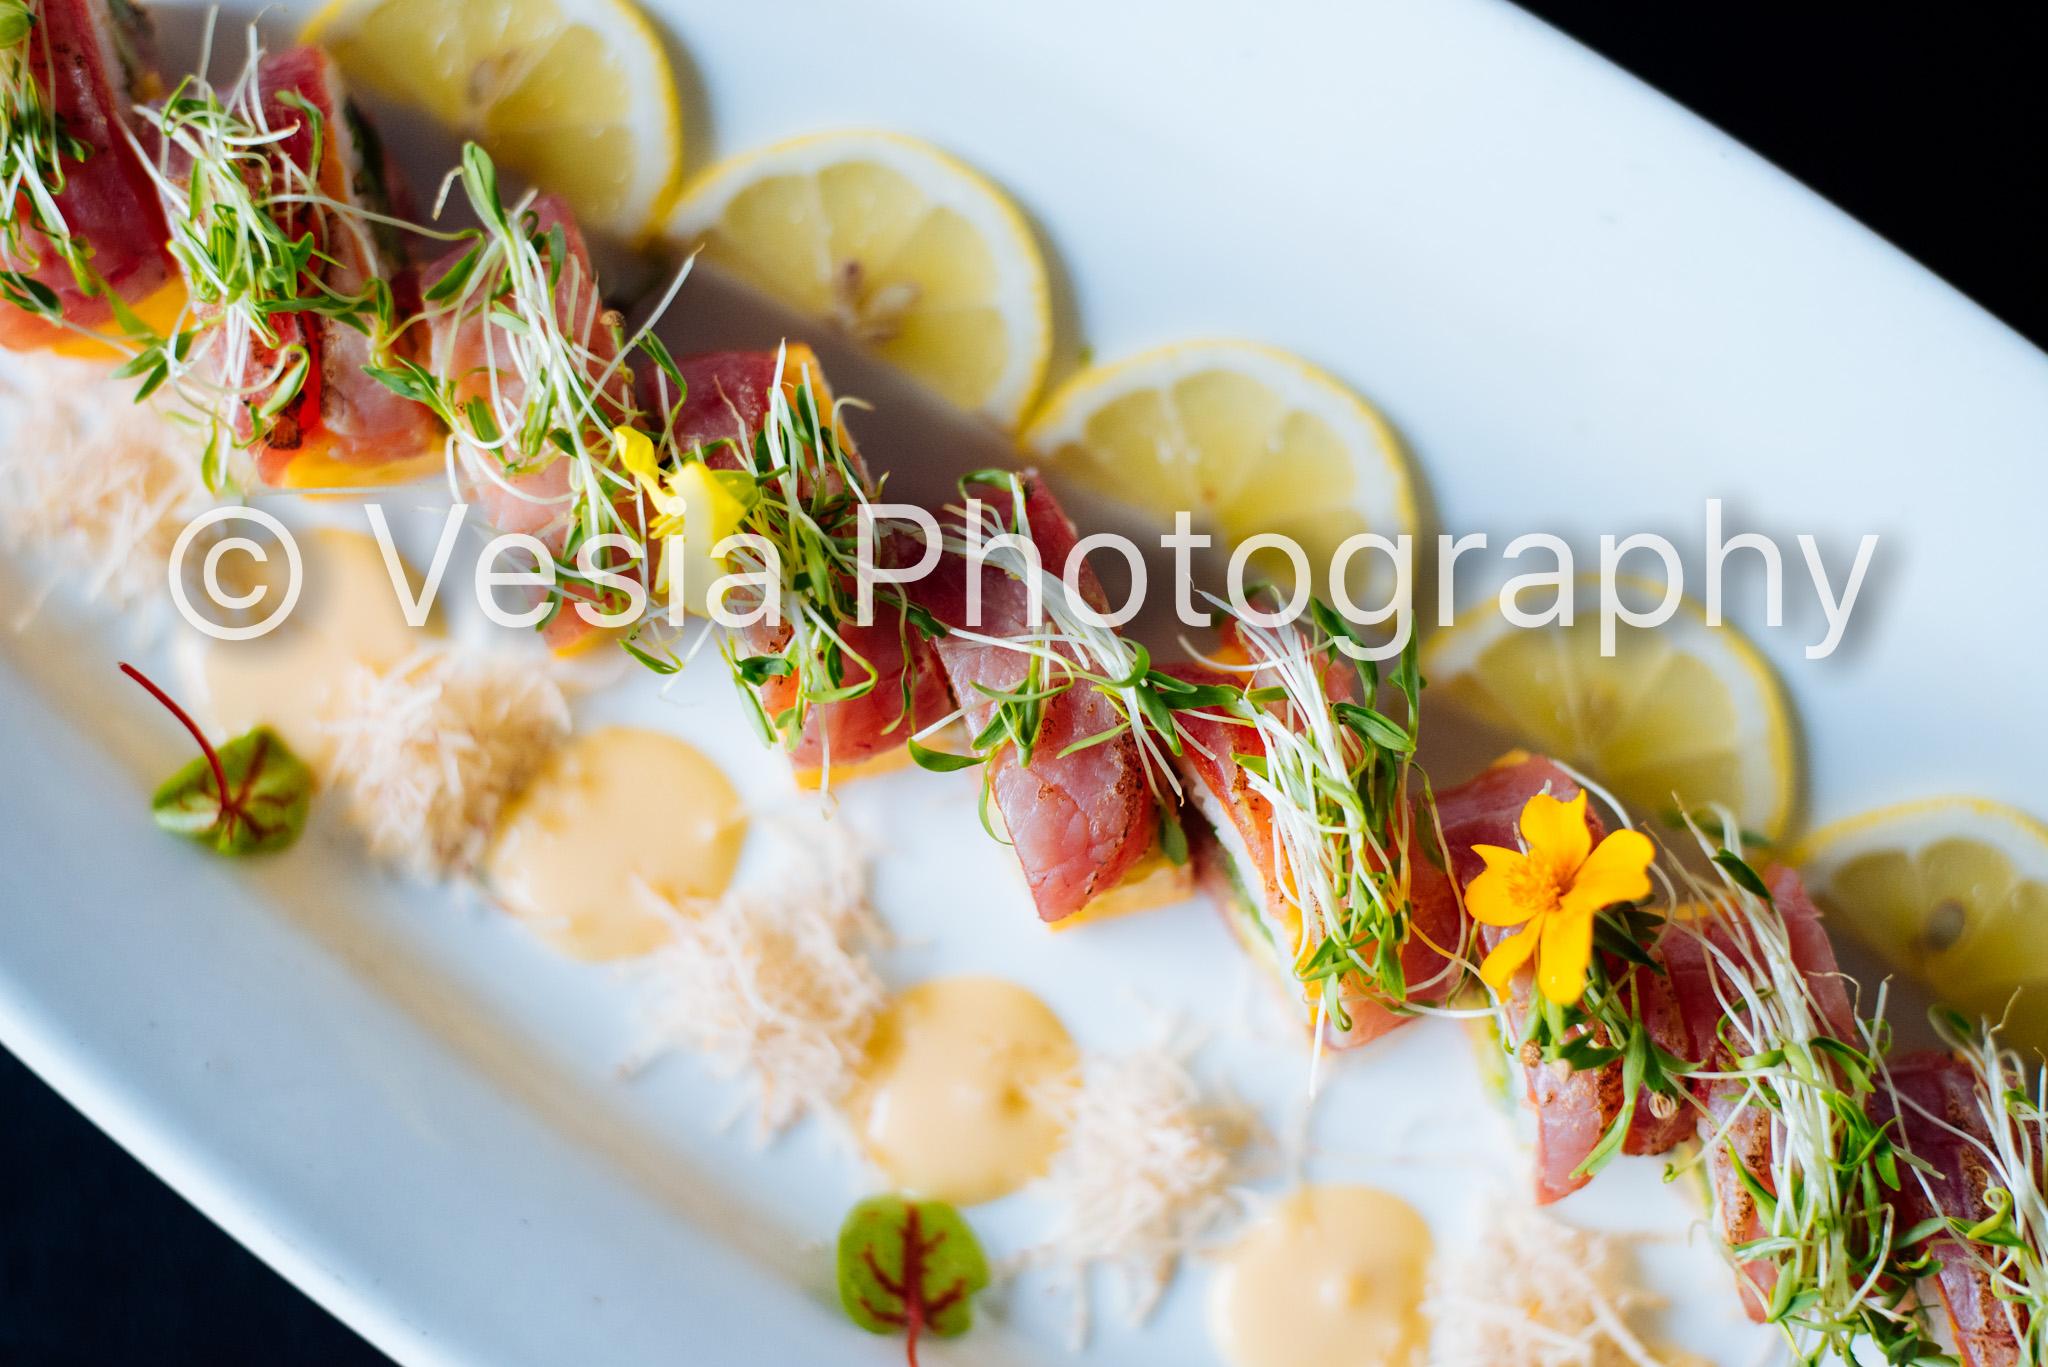 Caviar_Sushi_Proofs-7.jpg